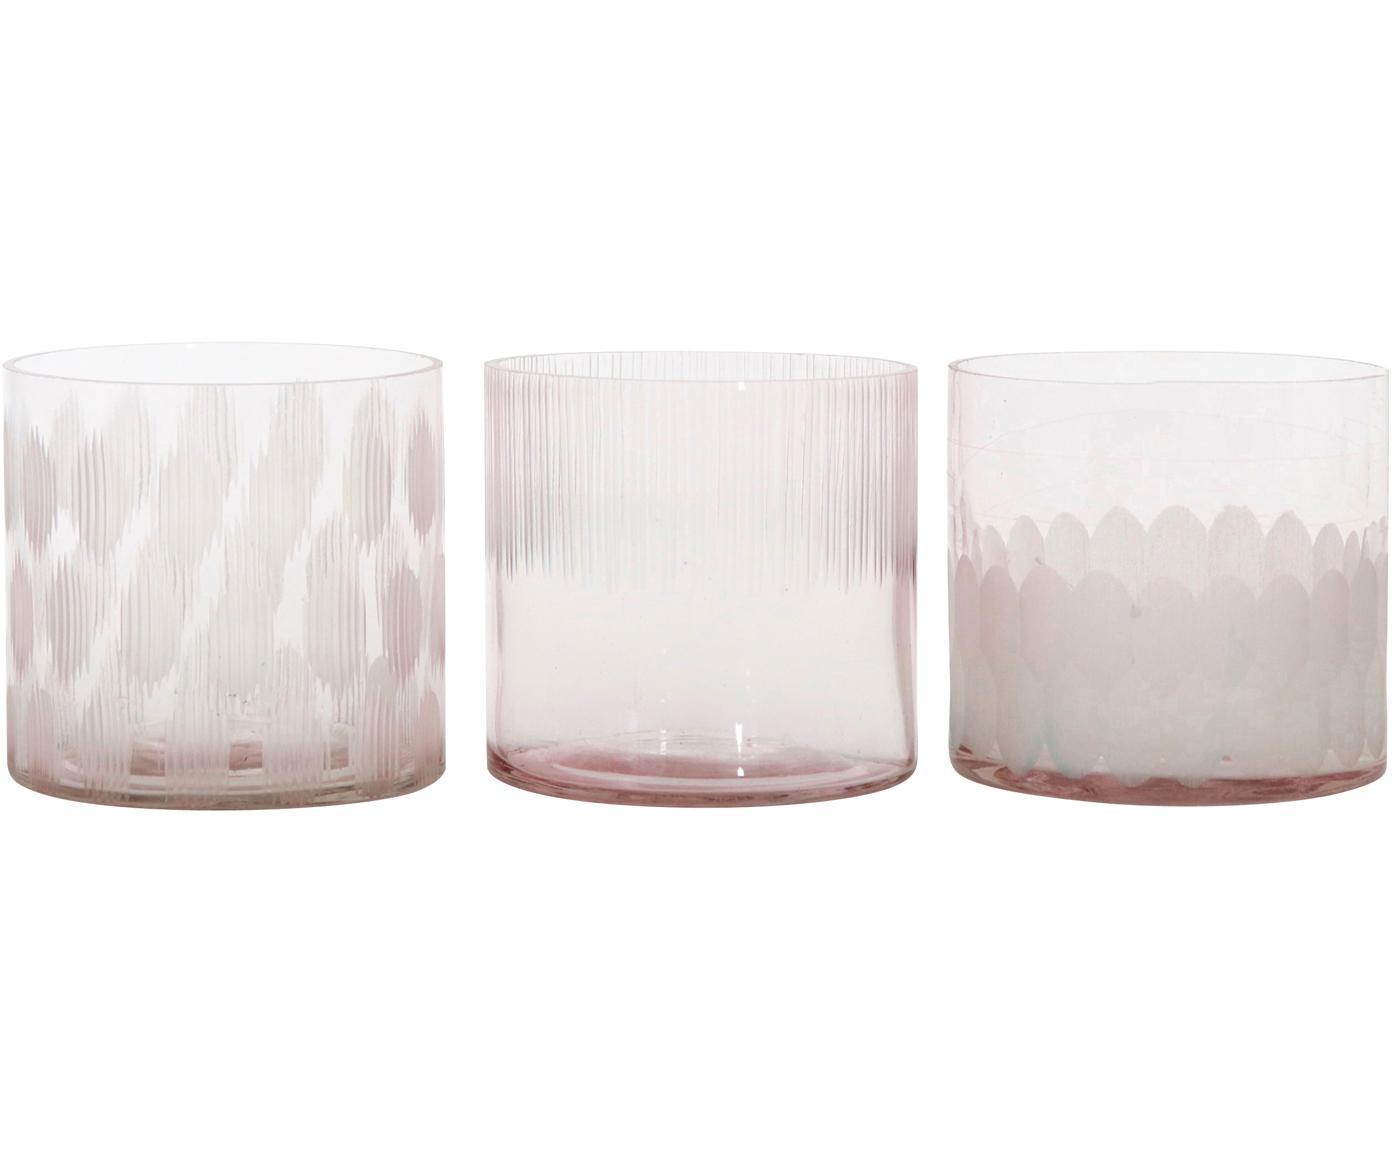 Windlichter-Set Cosmopol, 3-tlg., Glas, Rosa, Ø 8 x H 8 cm